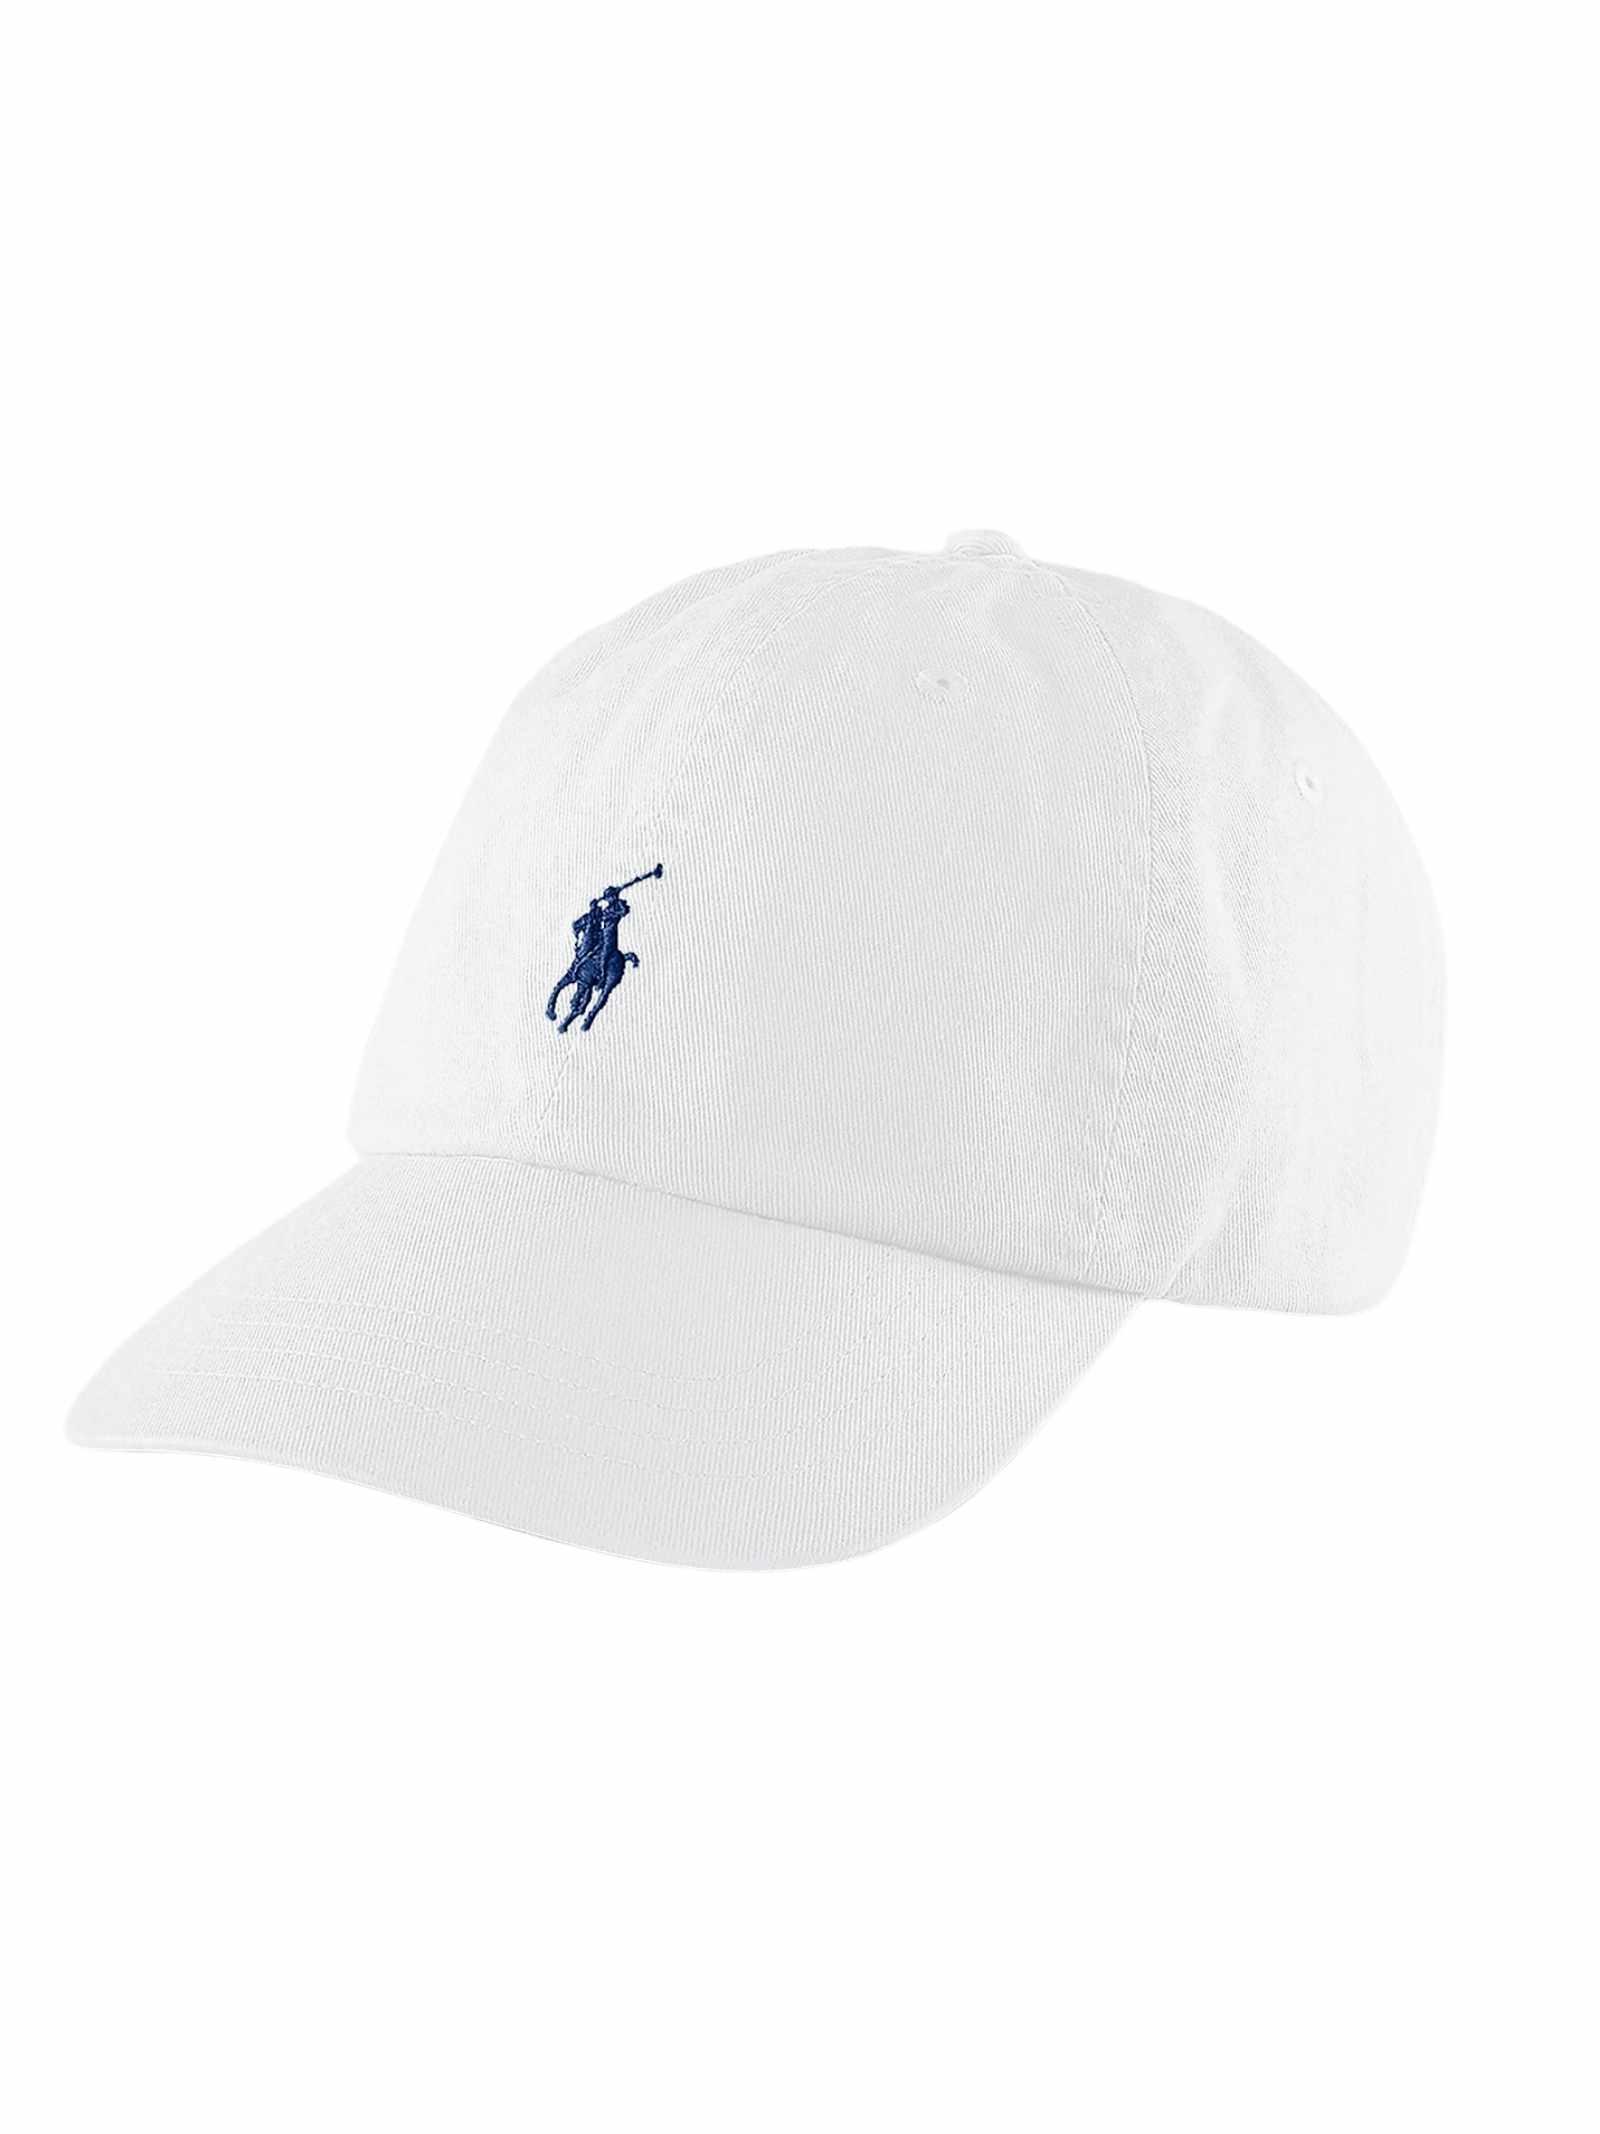 Cappello con visiera bianco RALPH LAUREN   Cappello   710-548524001